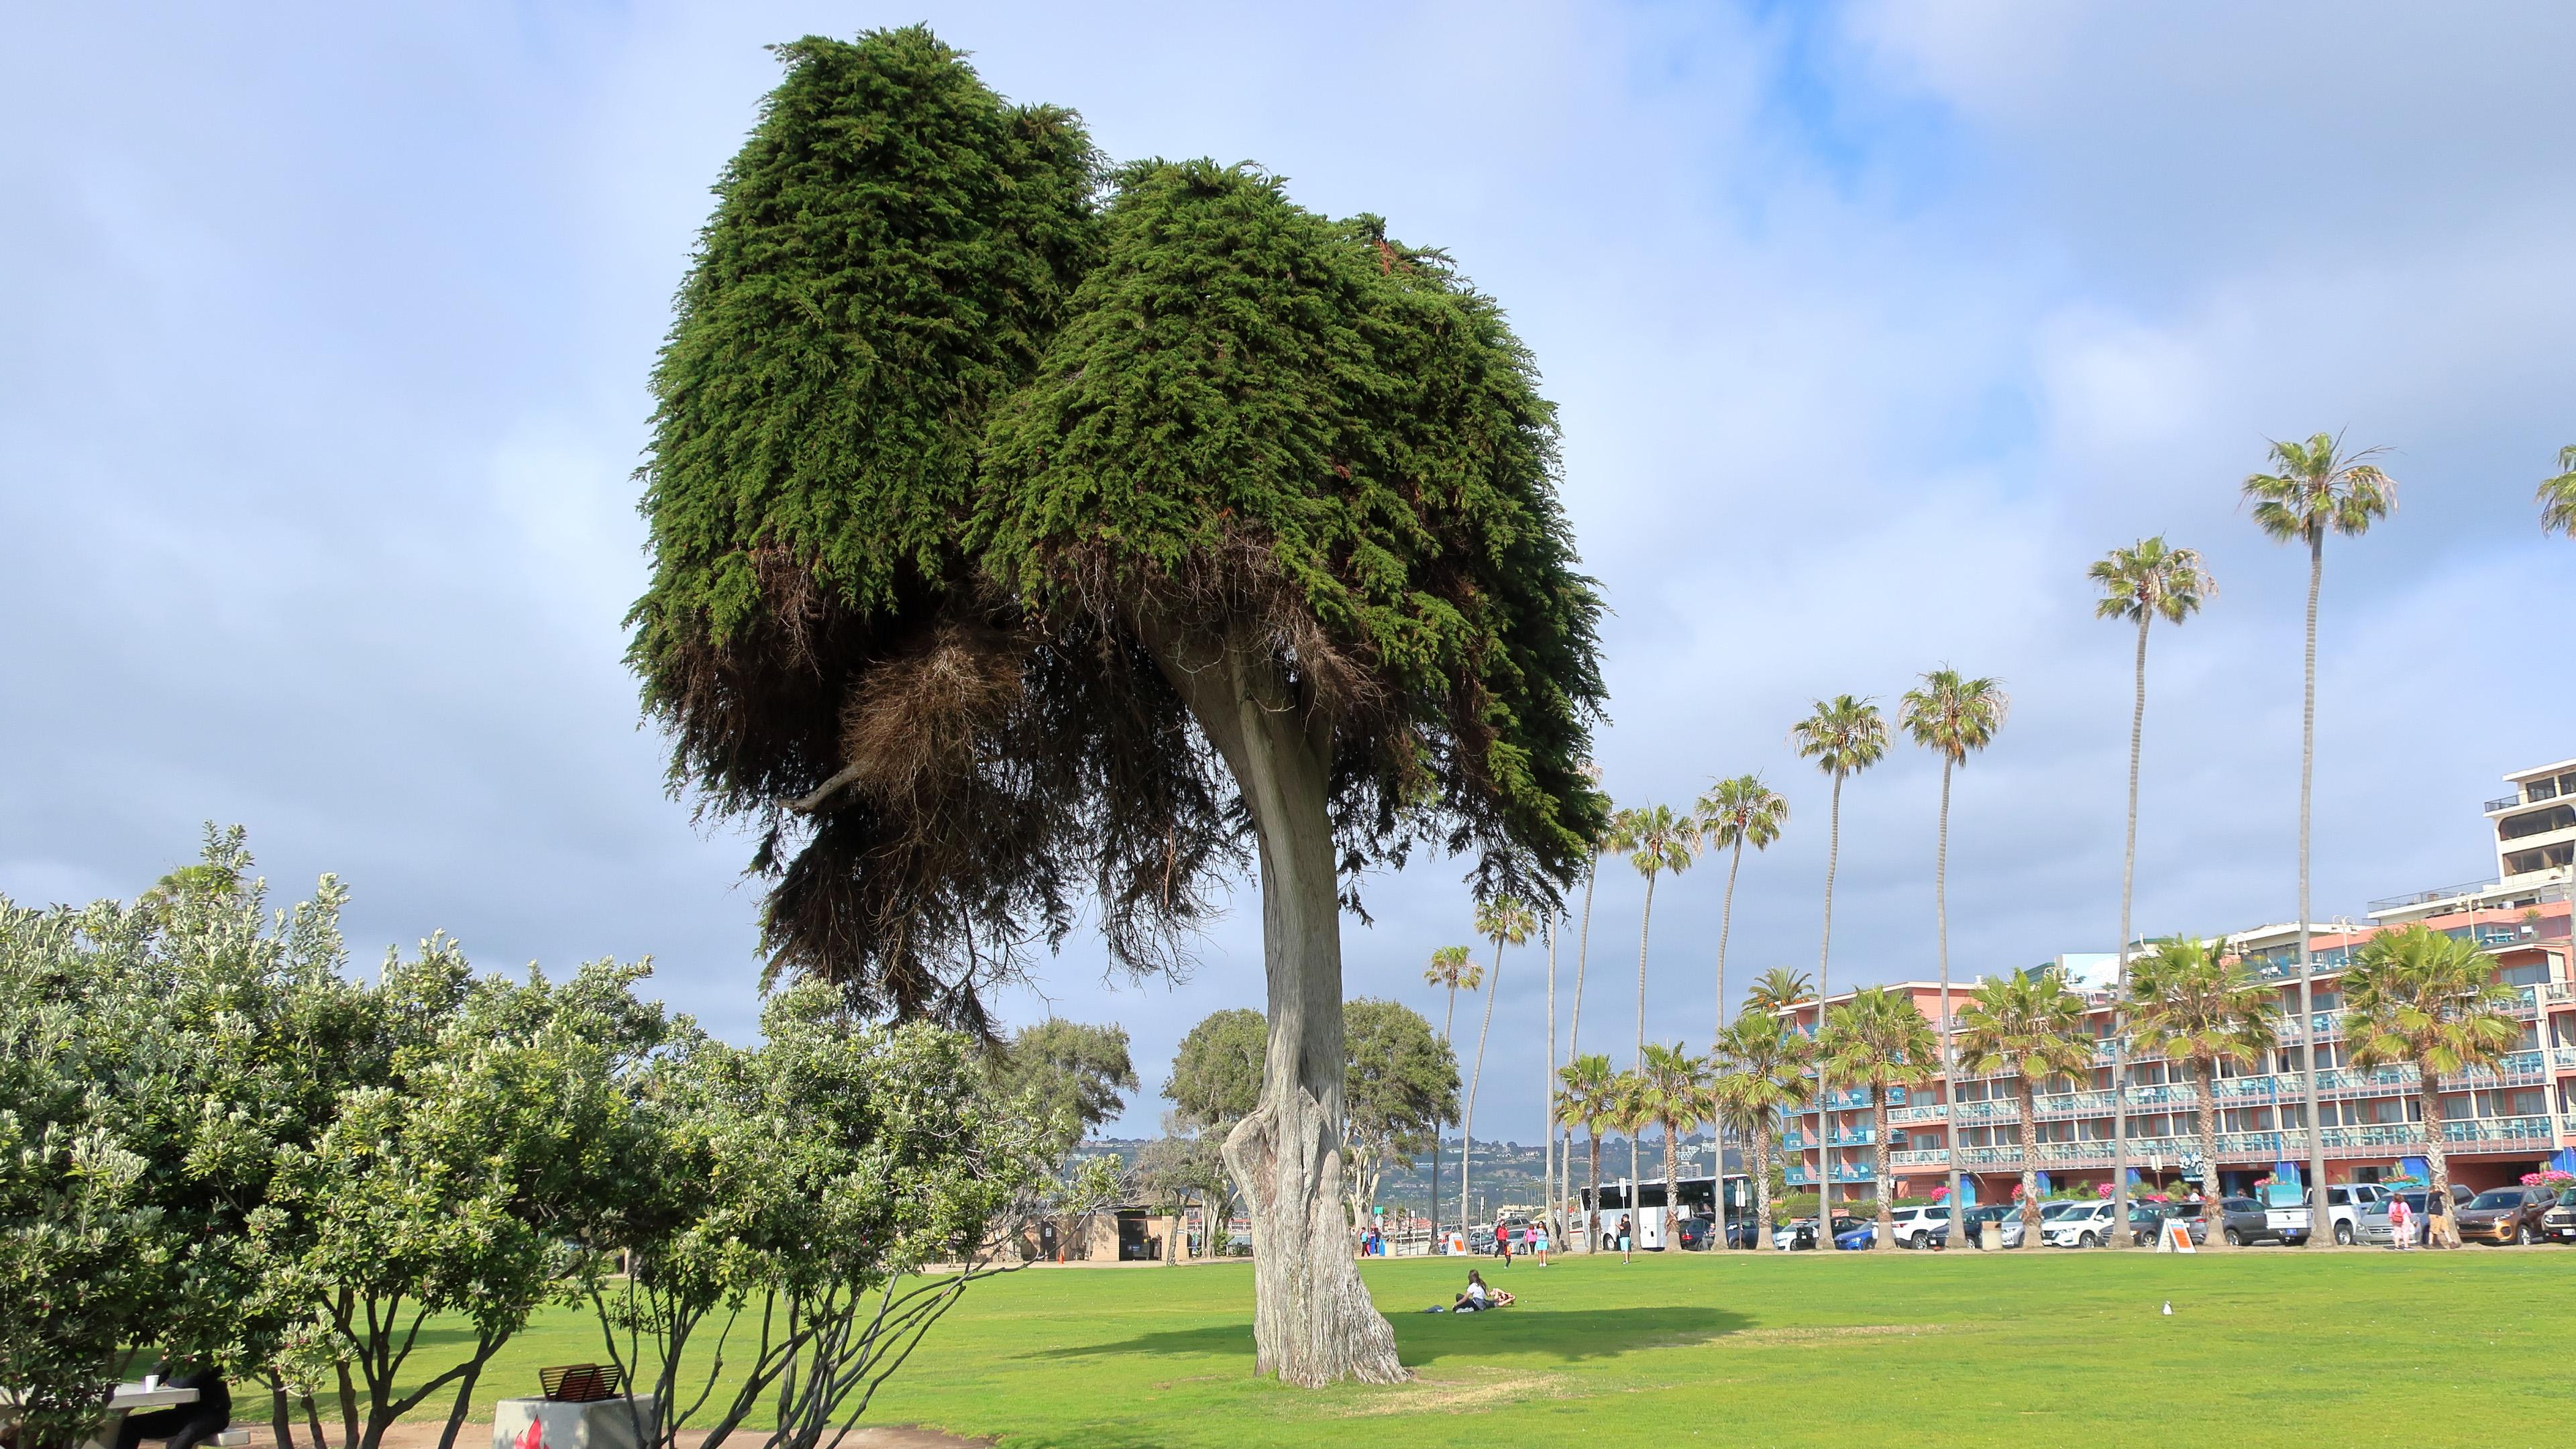 CA-SanDiego_EllenBrowningScrippsPark_Cultivar413_Flickr_2018_004_sig.jpg